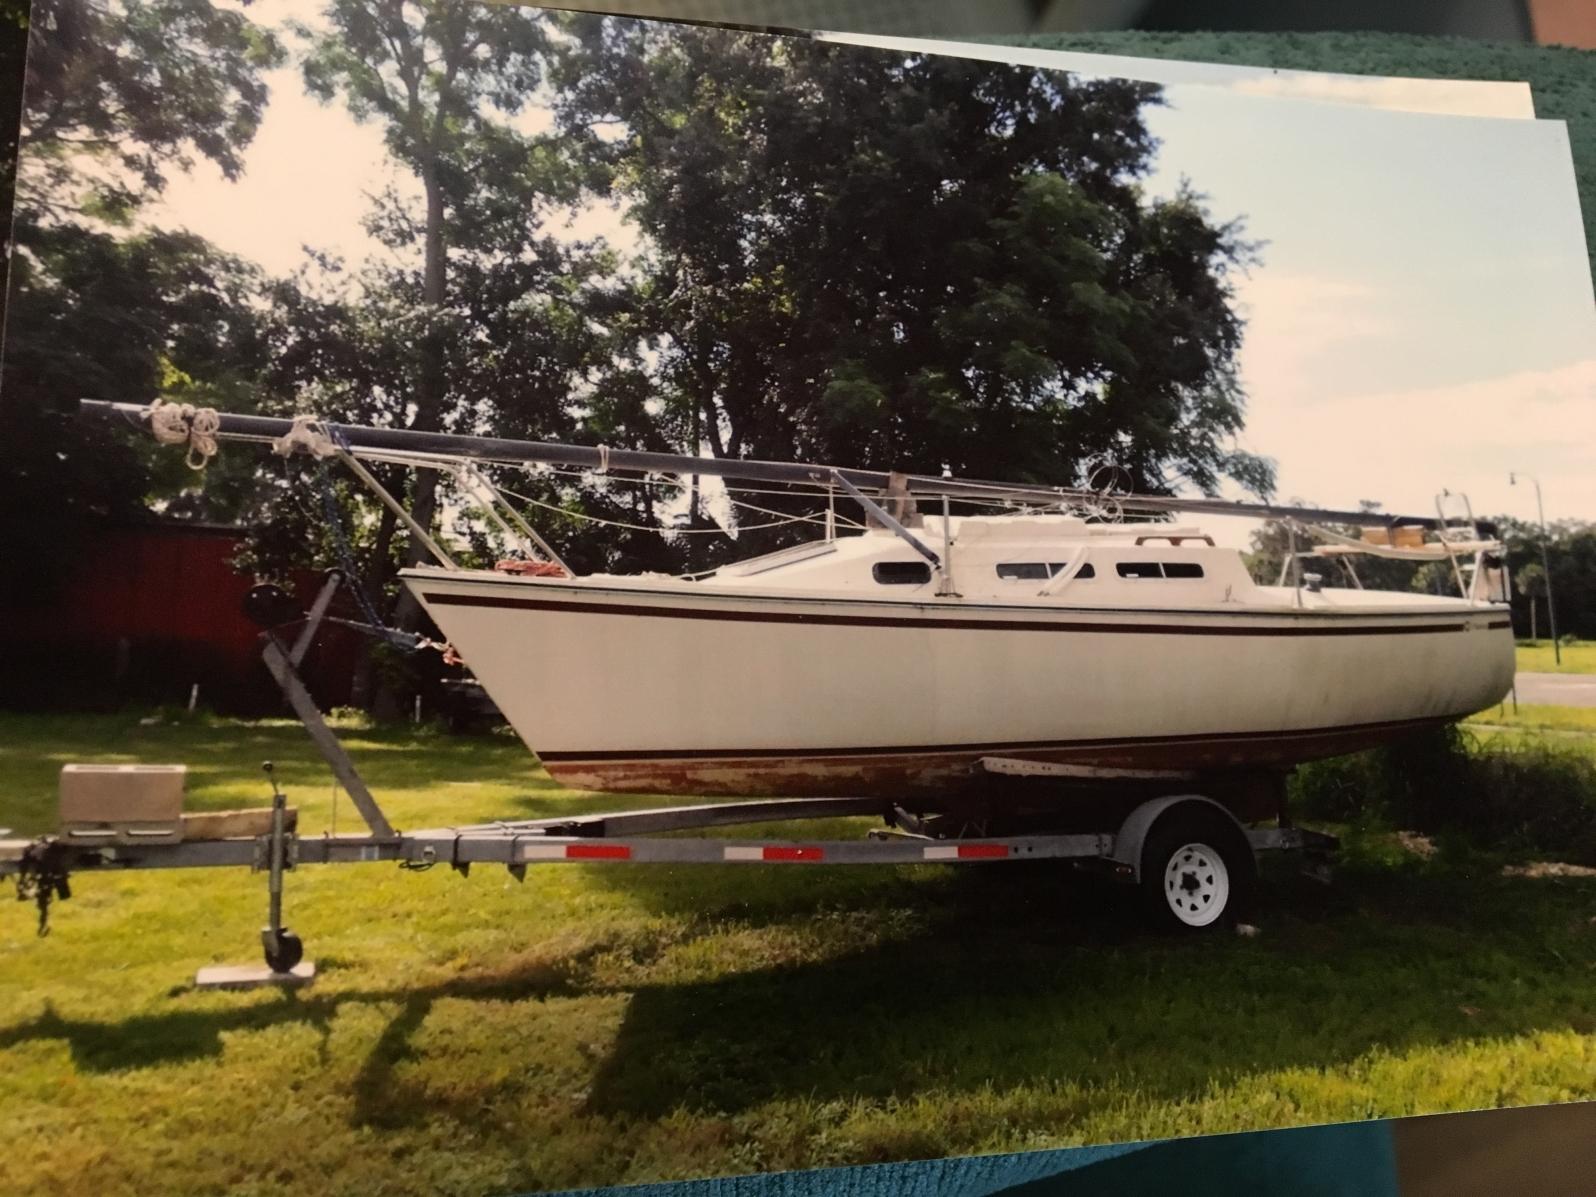 Wellcraft Starwind223 sailboat in Lake County, Fl, Florida, U.S.A